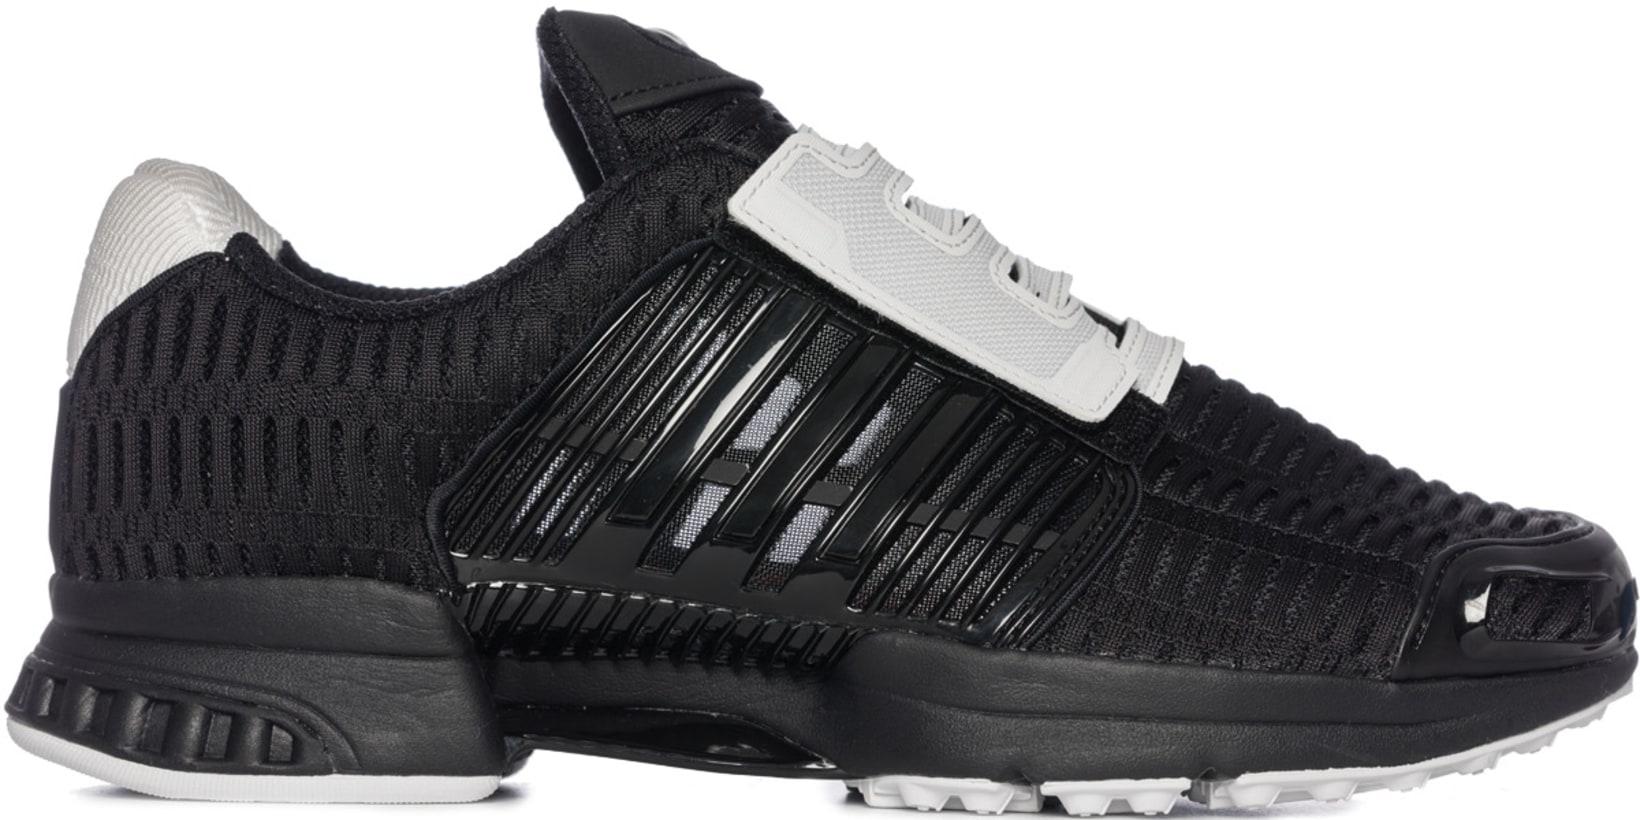 quality design 761f3 1a4b6 adidas Originals - ClimaCool 1 CMF - Core Black/Core Black/Vintage White